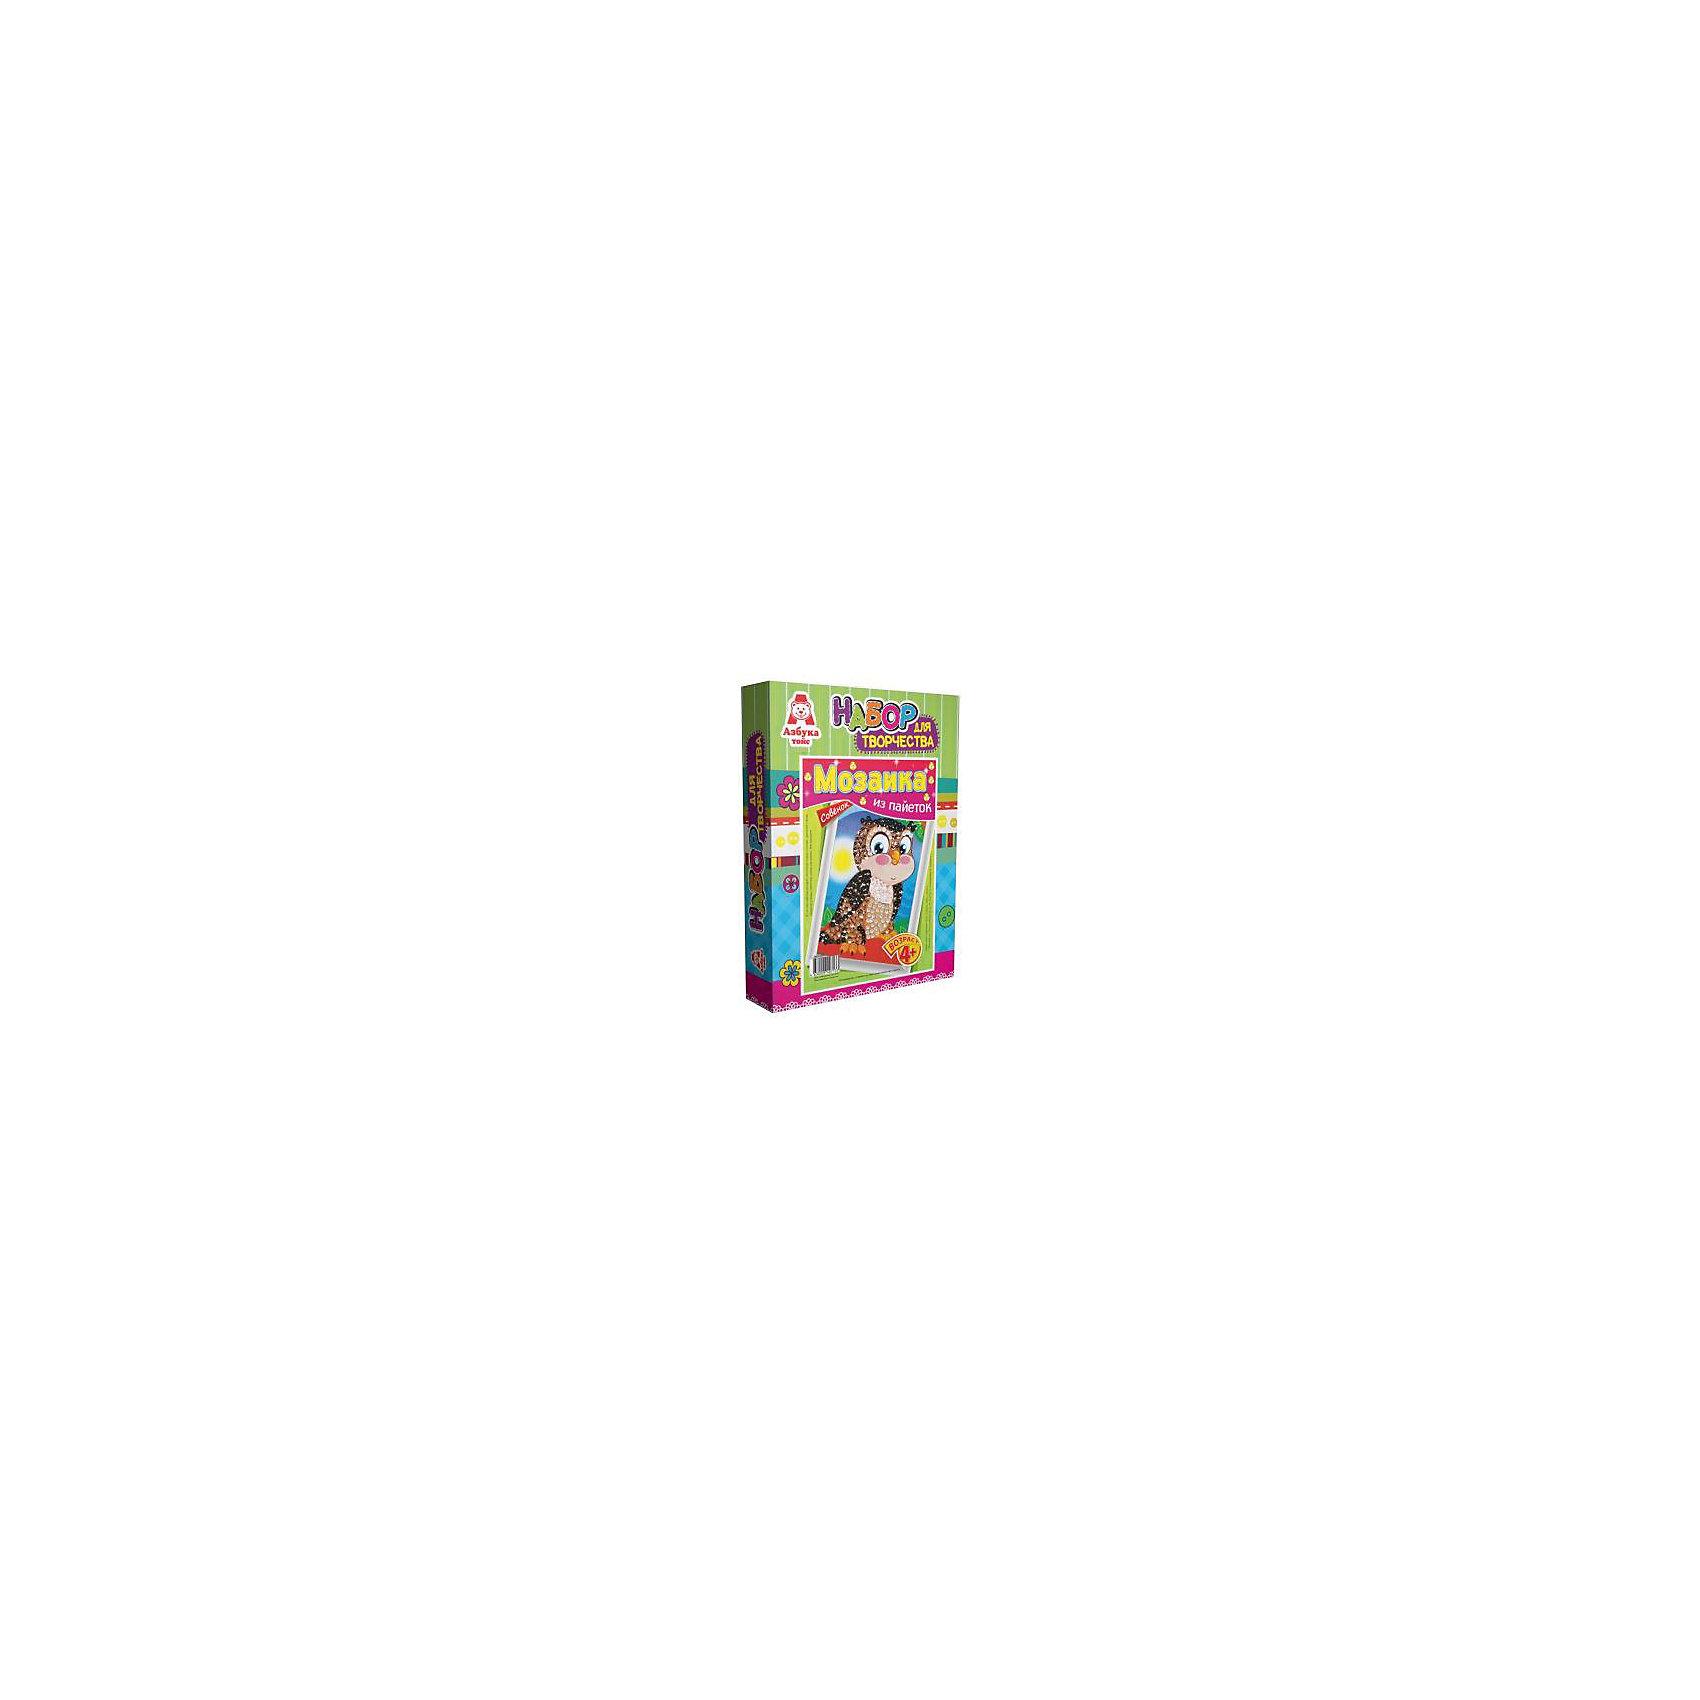 Азбука Тойс Картина из пайеток Совёнок картины в квартиру картина etude 2 102х130 см